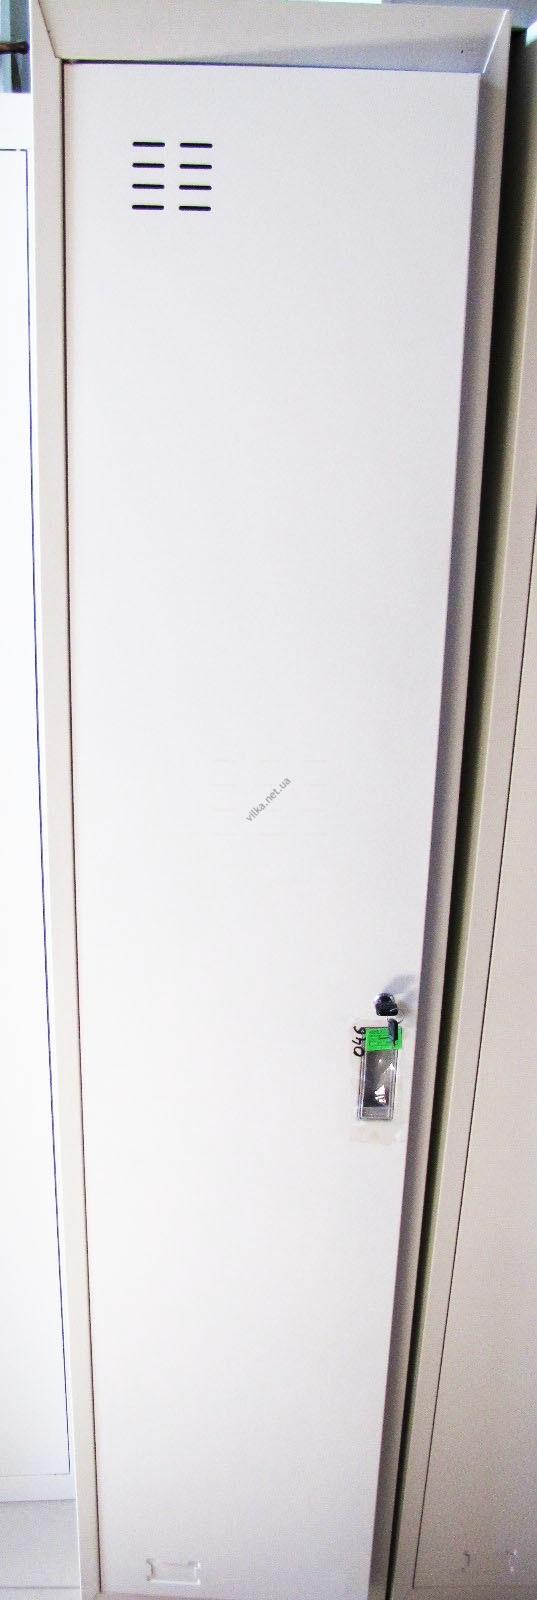 Шкаф металлический одинарный белый  т = 0,8 мм.